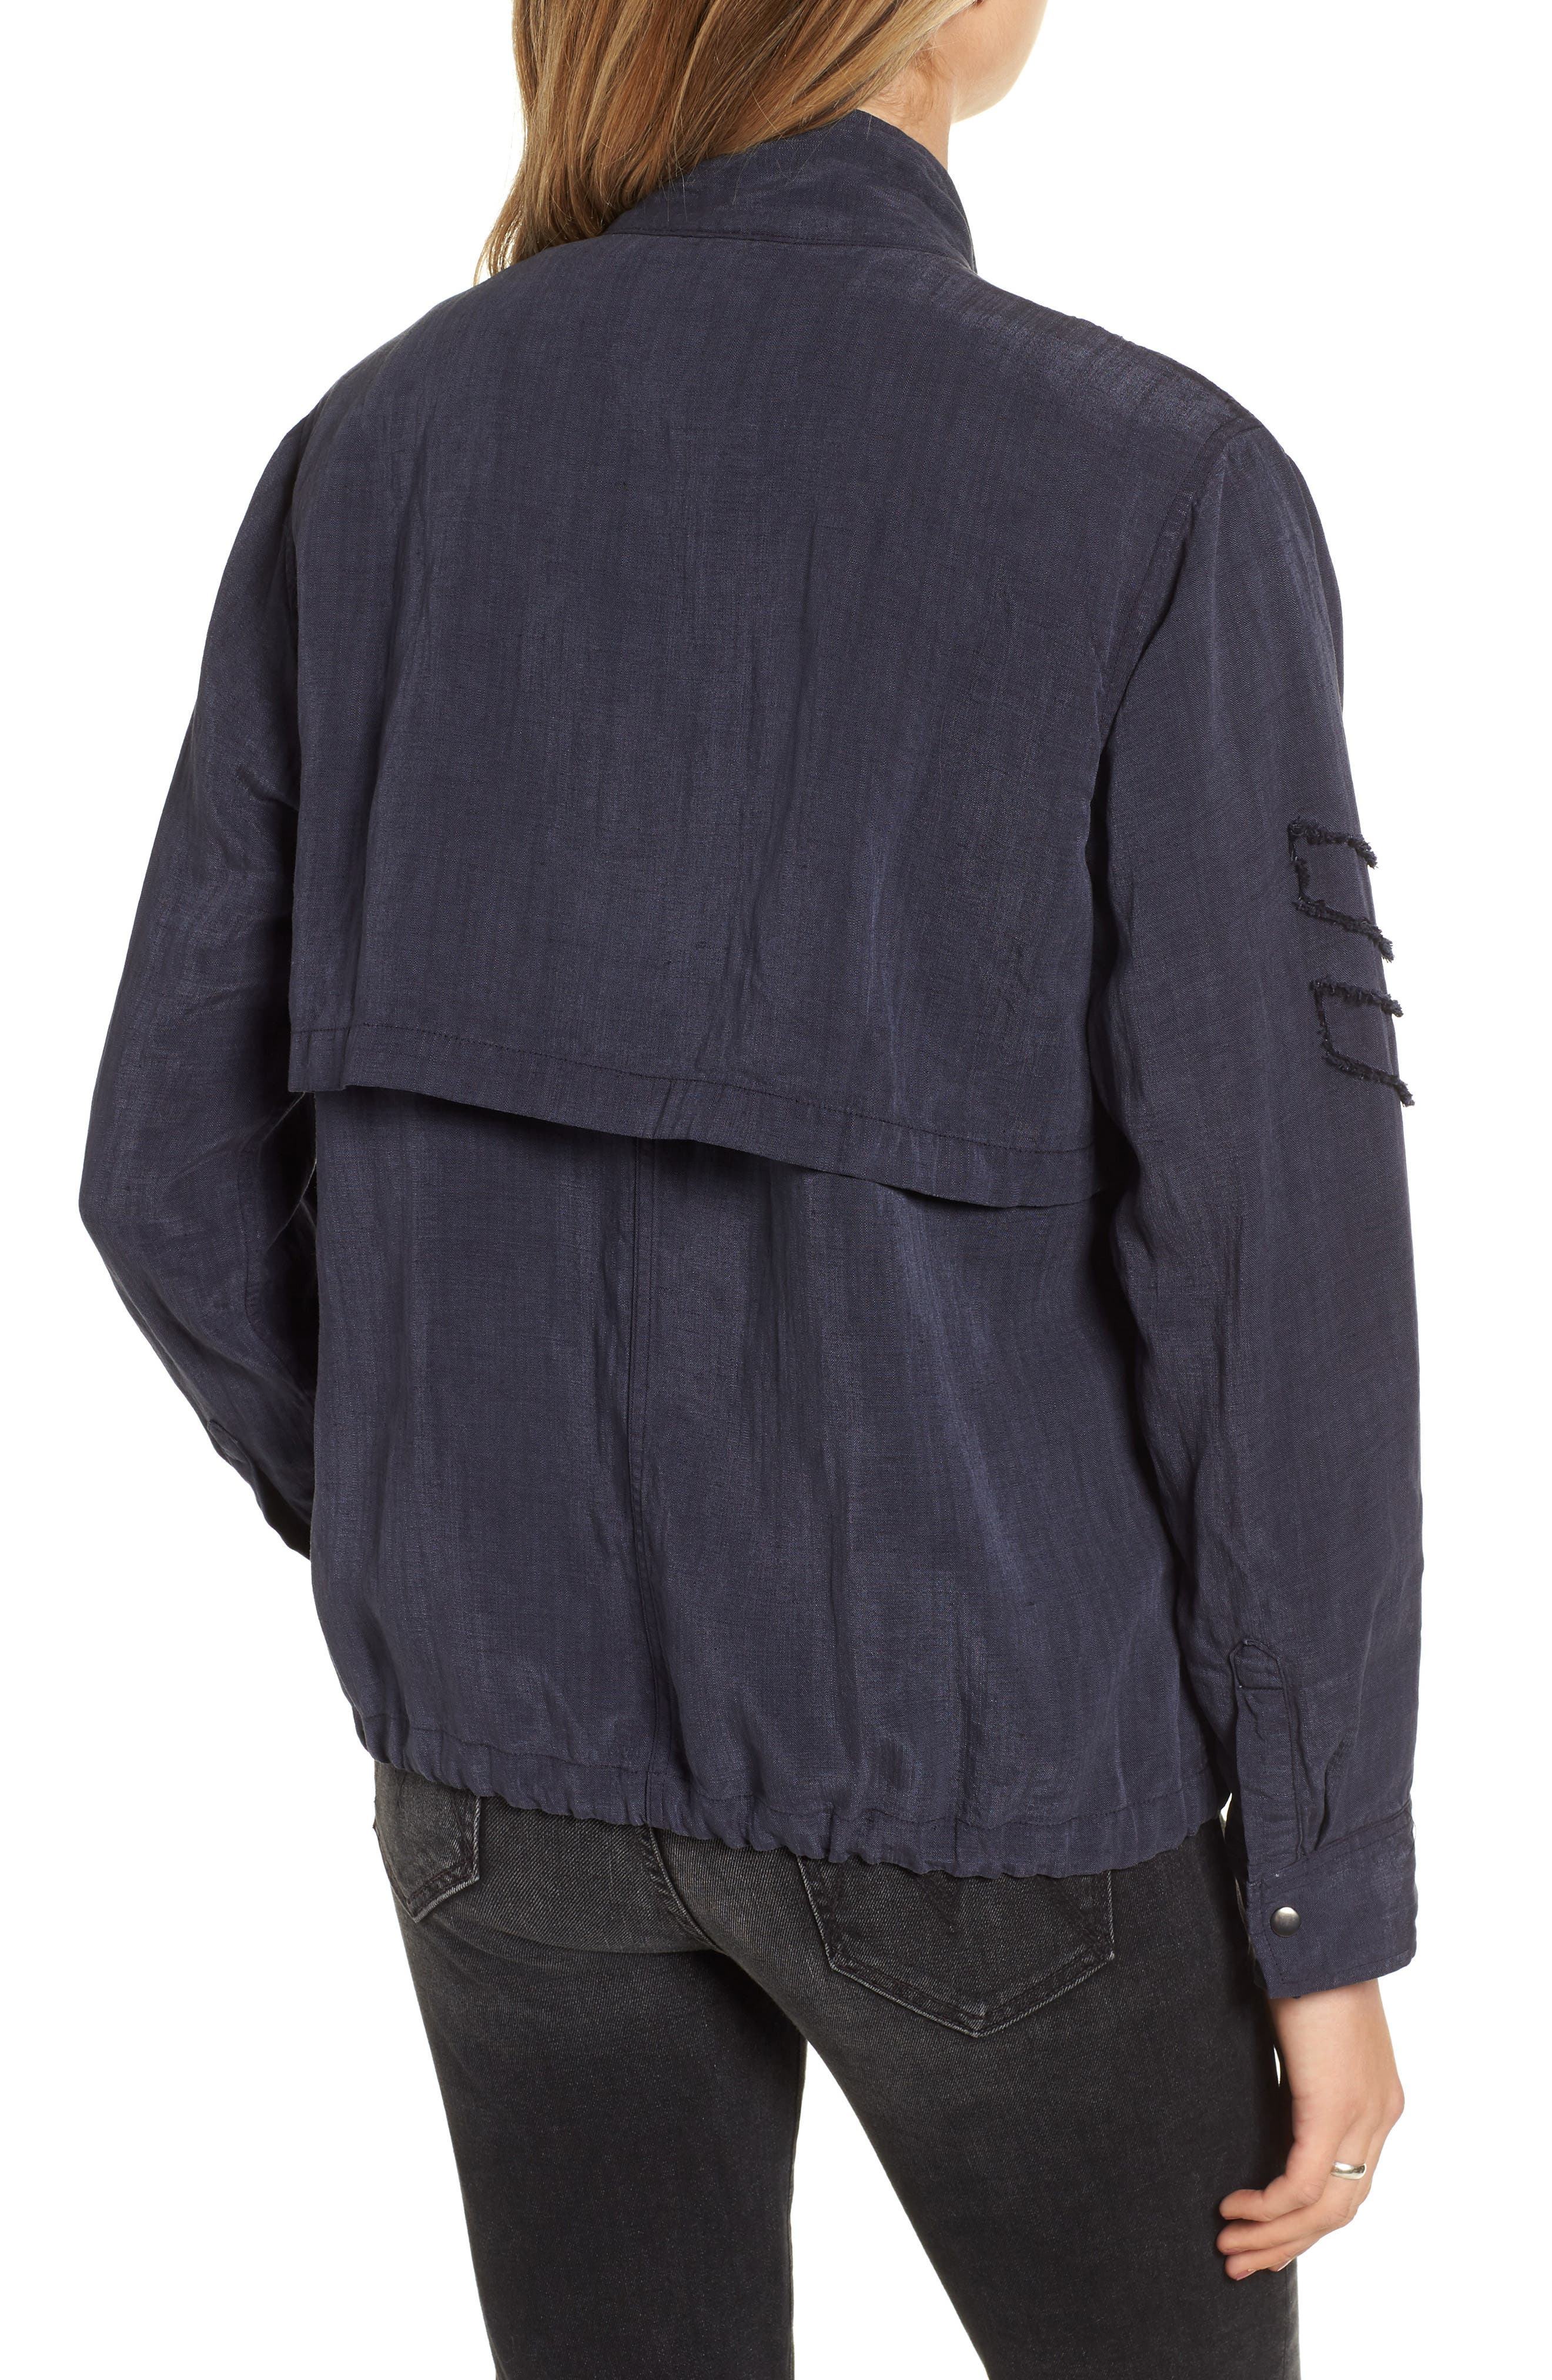 Halifax Drawstring Jacket,                             Alternate thumbnail 2, color,                             NAVY